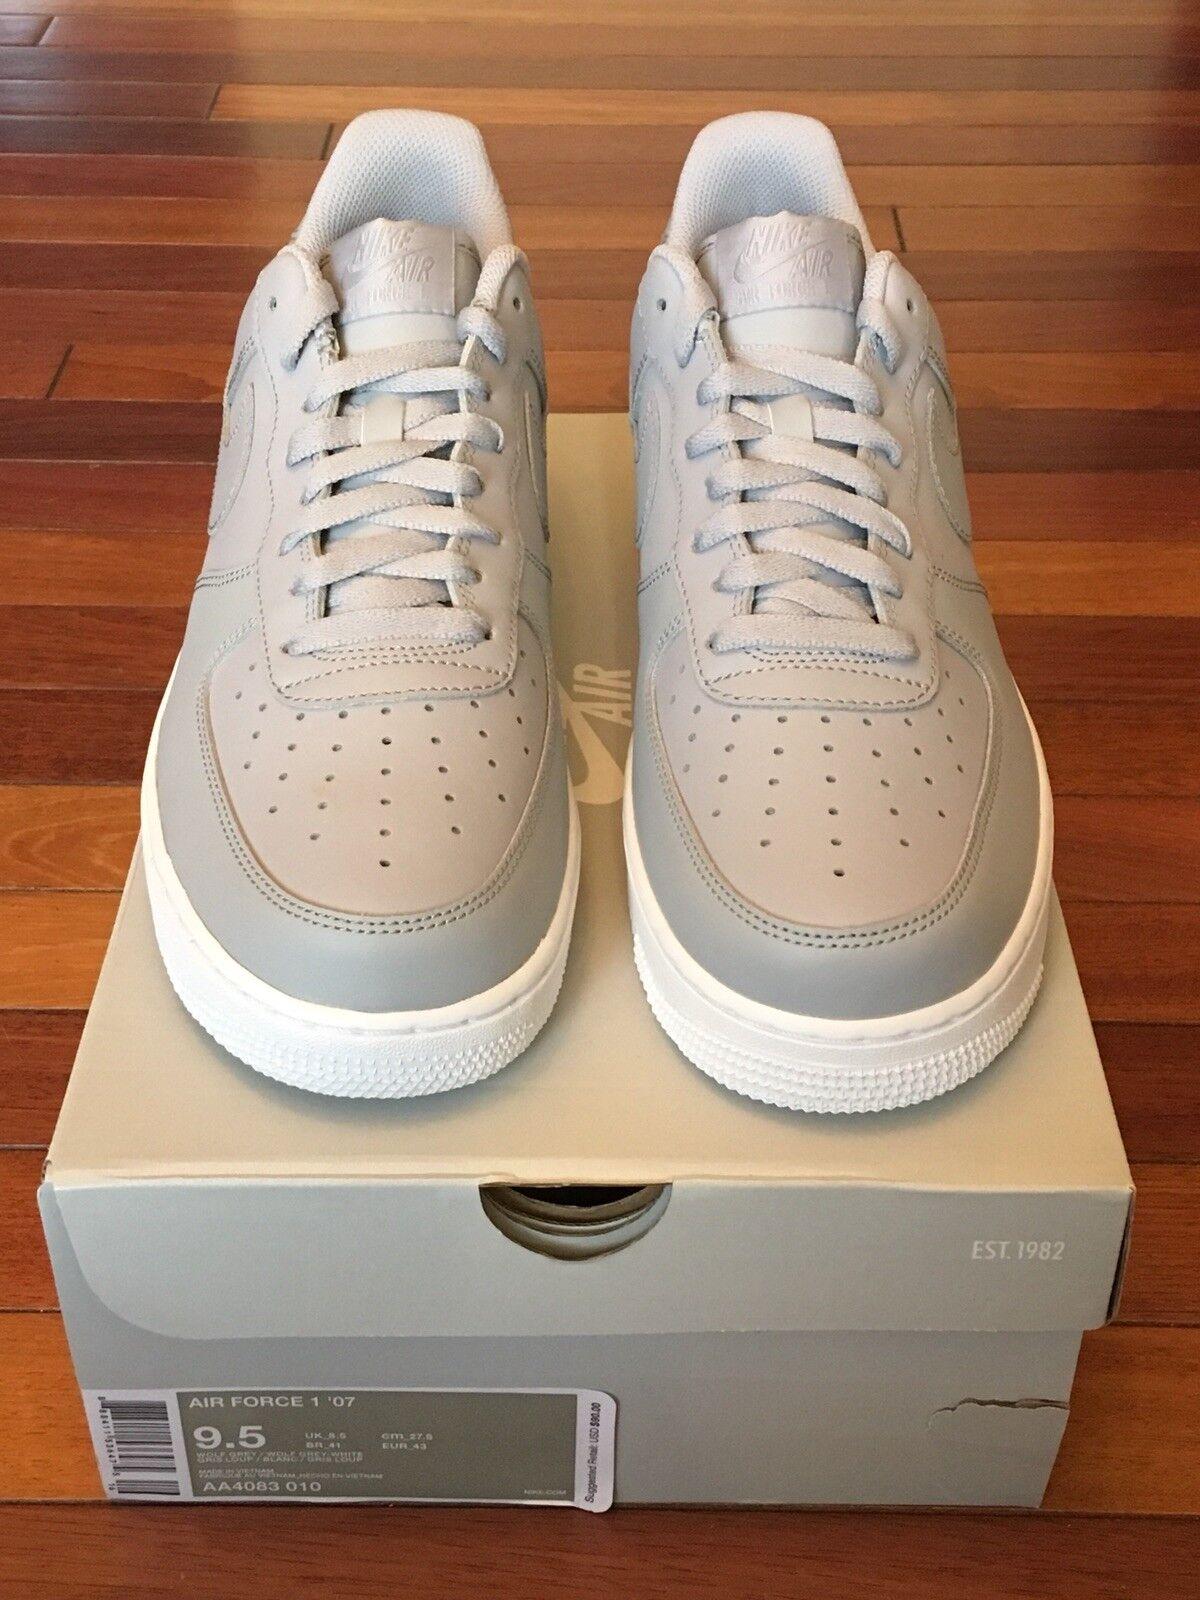 Nike air force 1 '07 aa4083-010 lupo grigio / lupo grigio bianco uomo